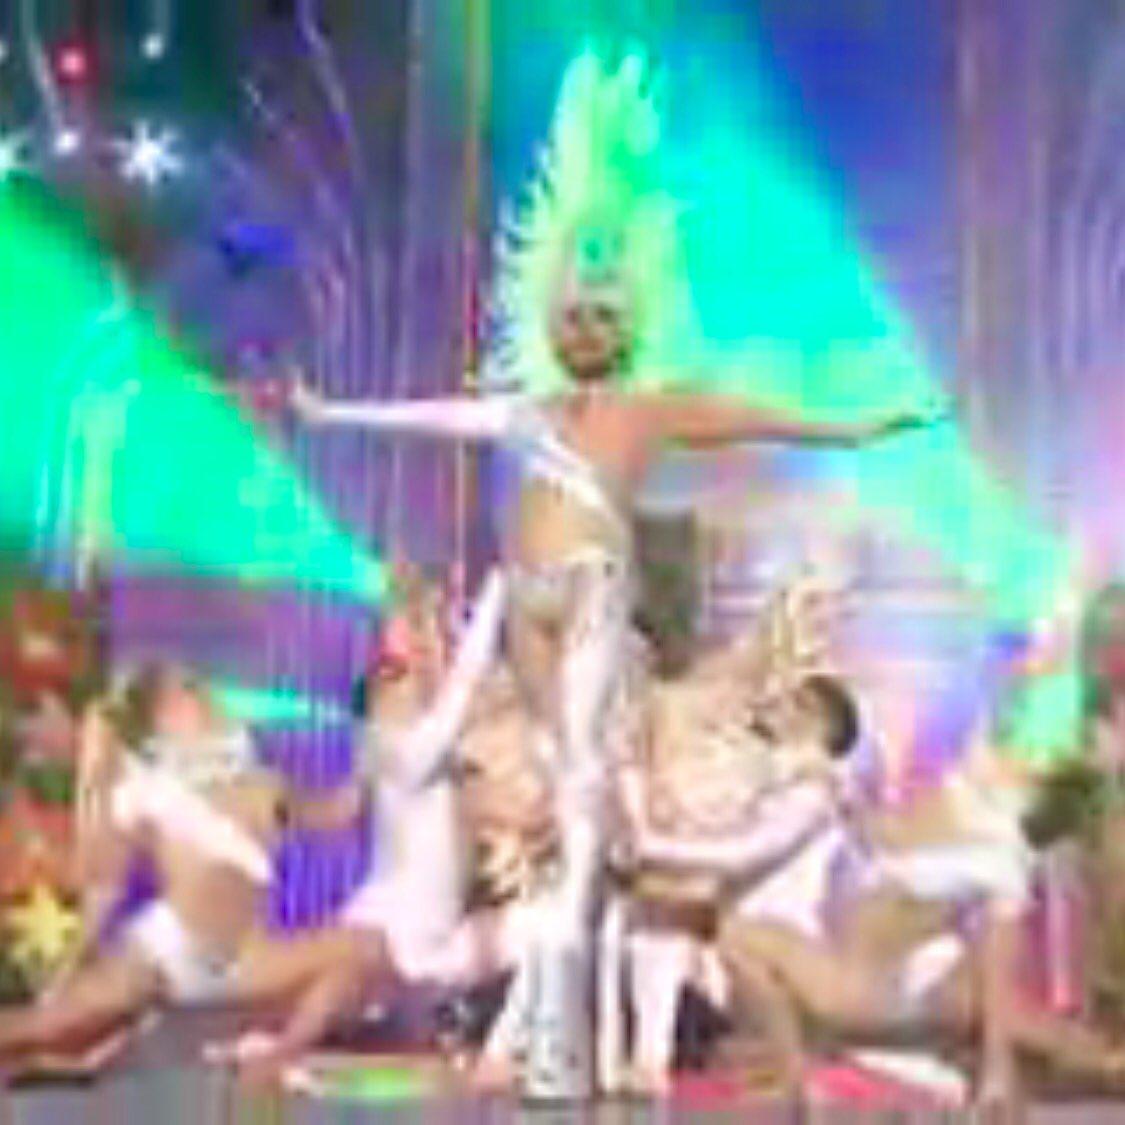 Drag AURUM en la #GalaDragLPGC representando a @TurismoArona y @GrupoElCine @FiestasArona https://t.co/dGqMLkjToO